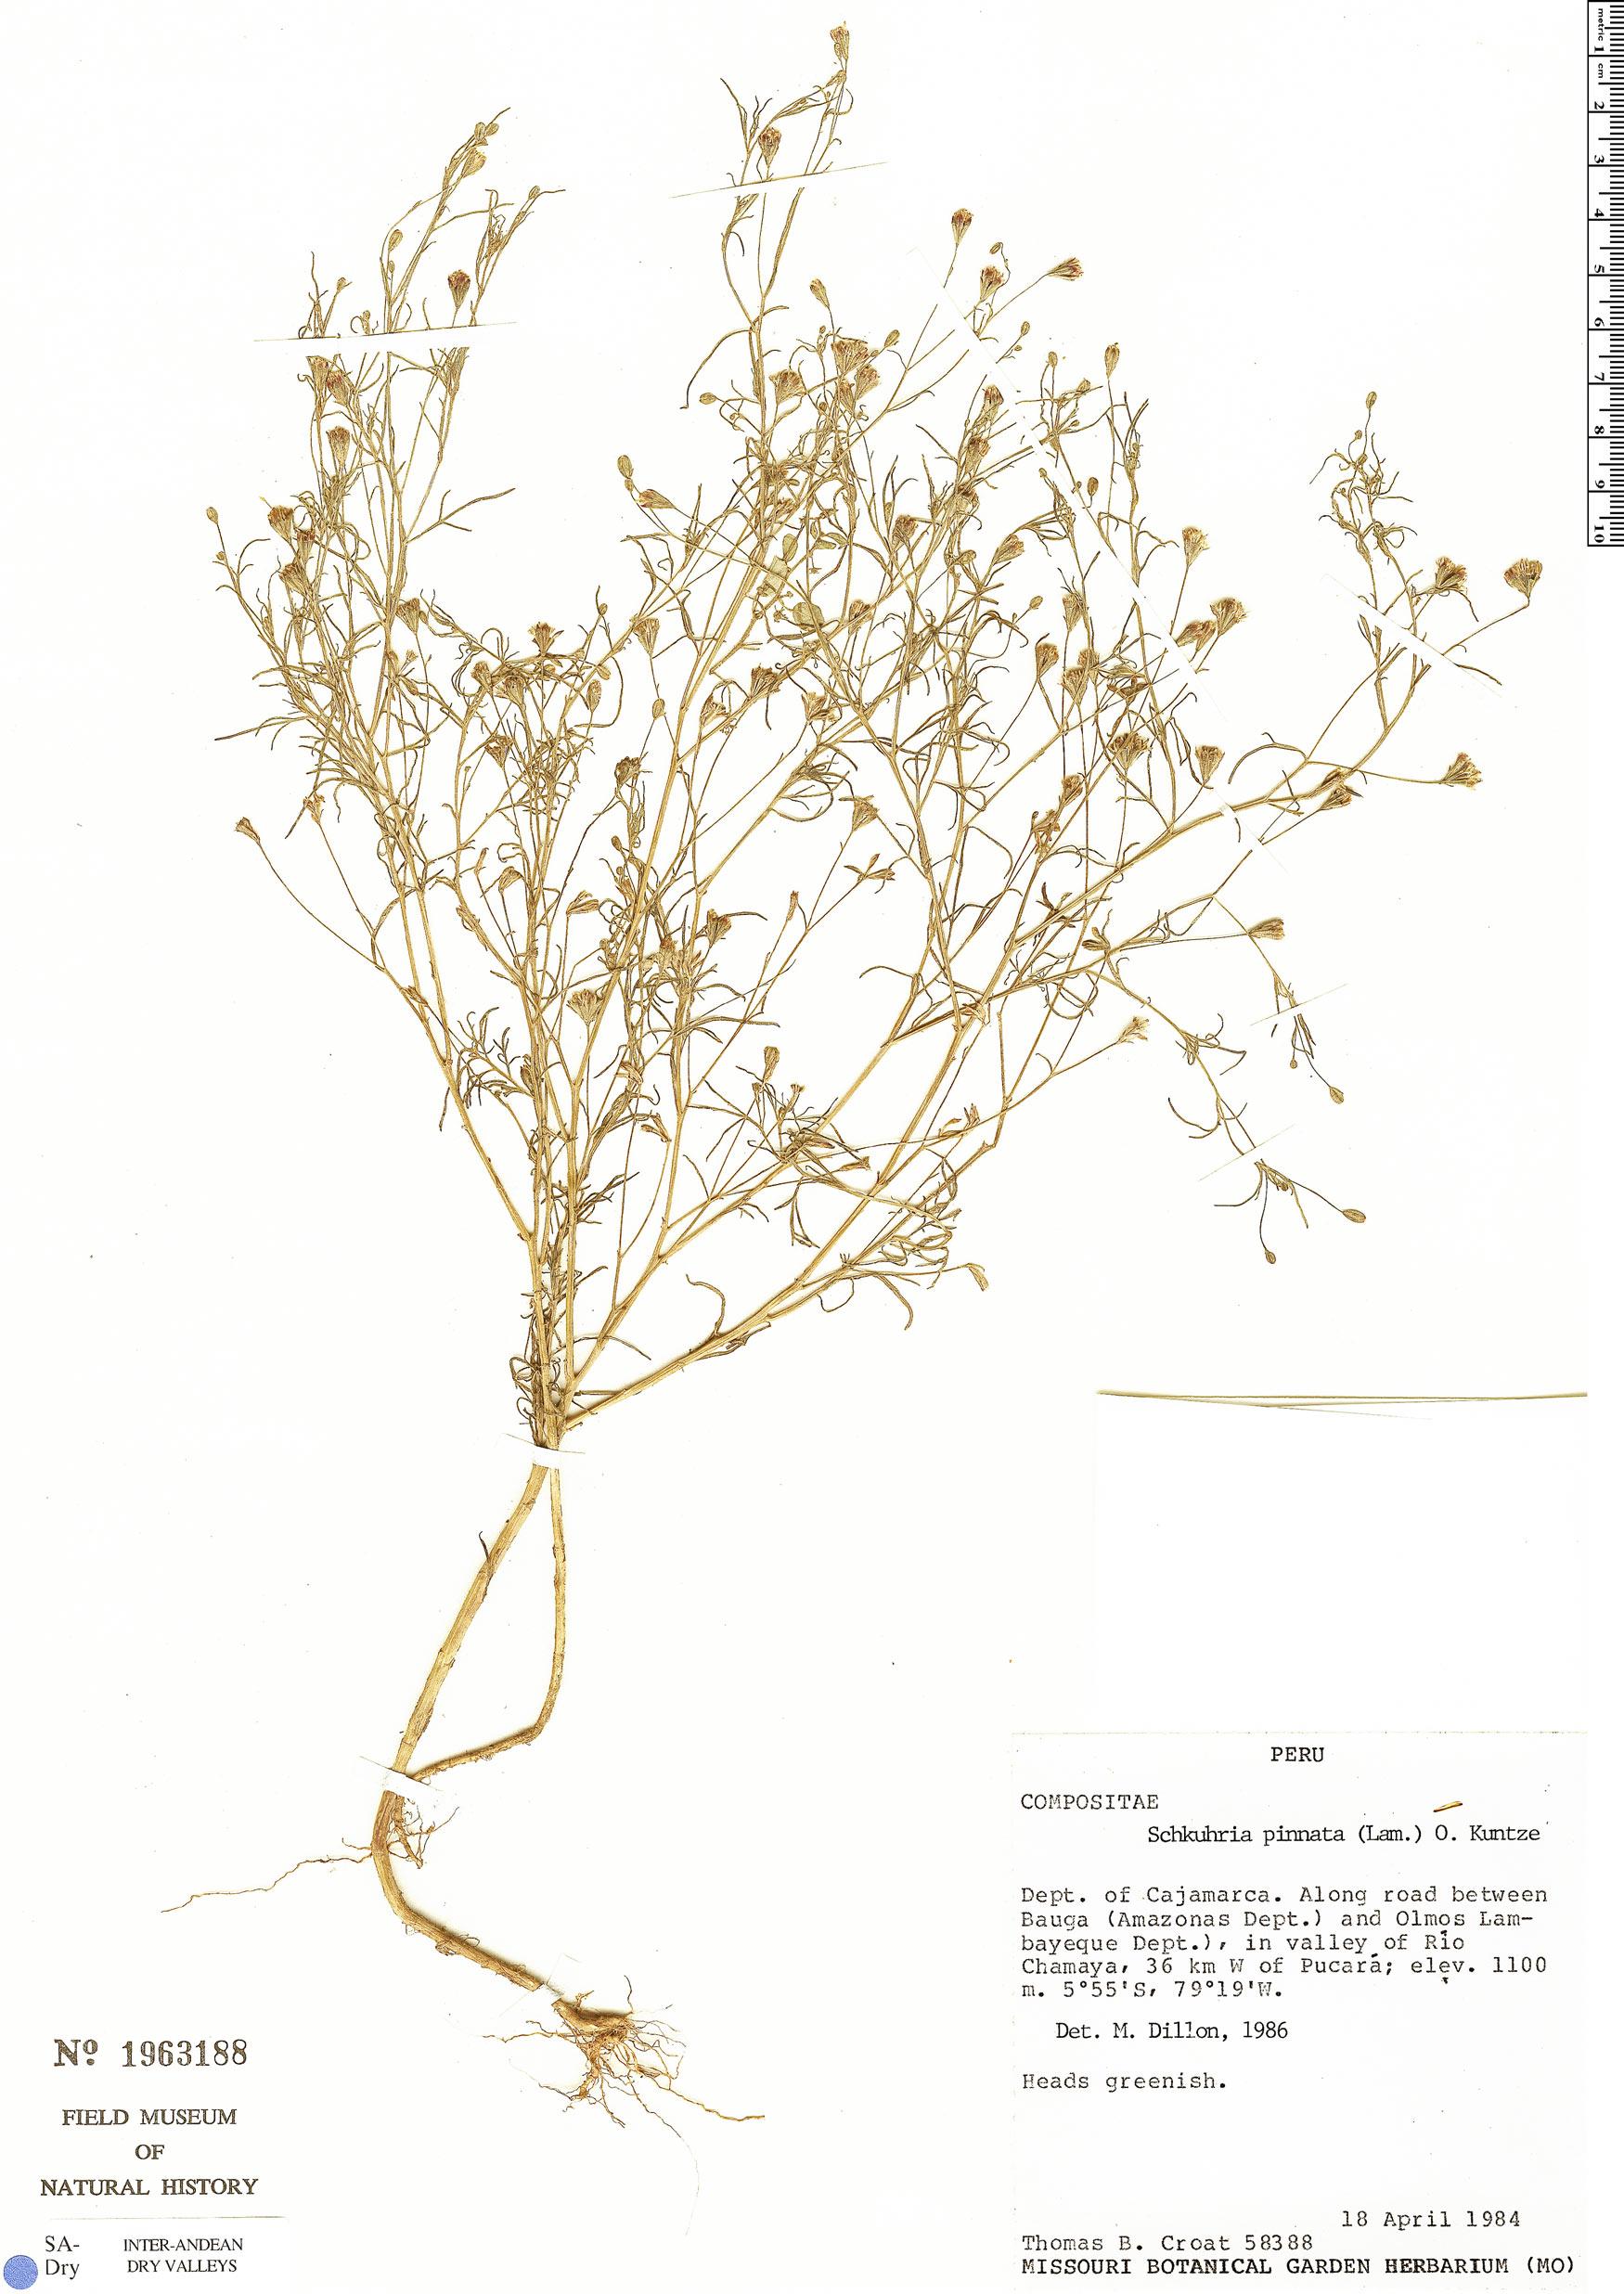 Specimen: Schkuhria pinnata